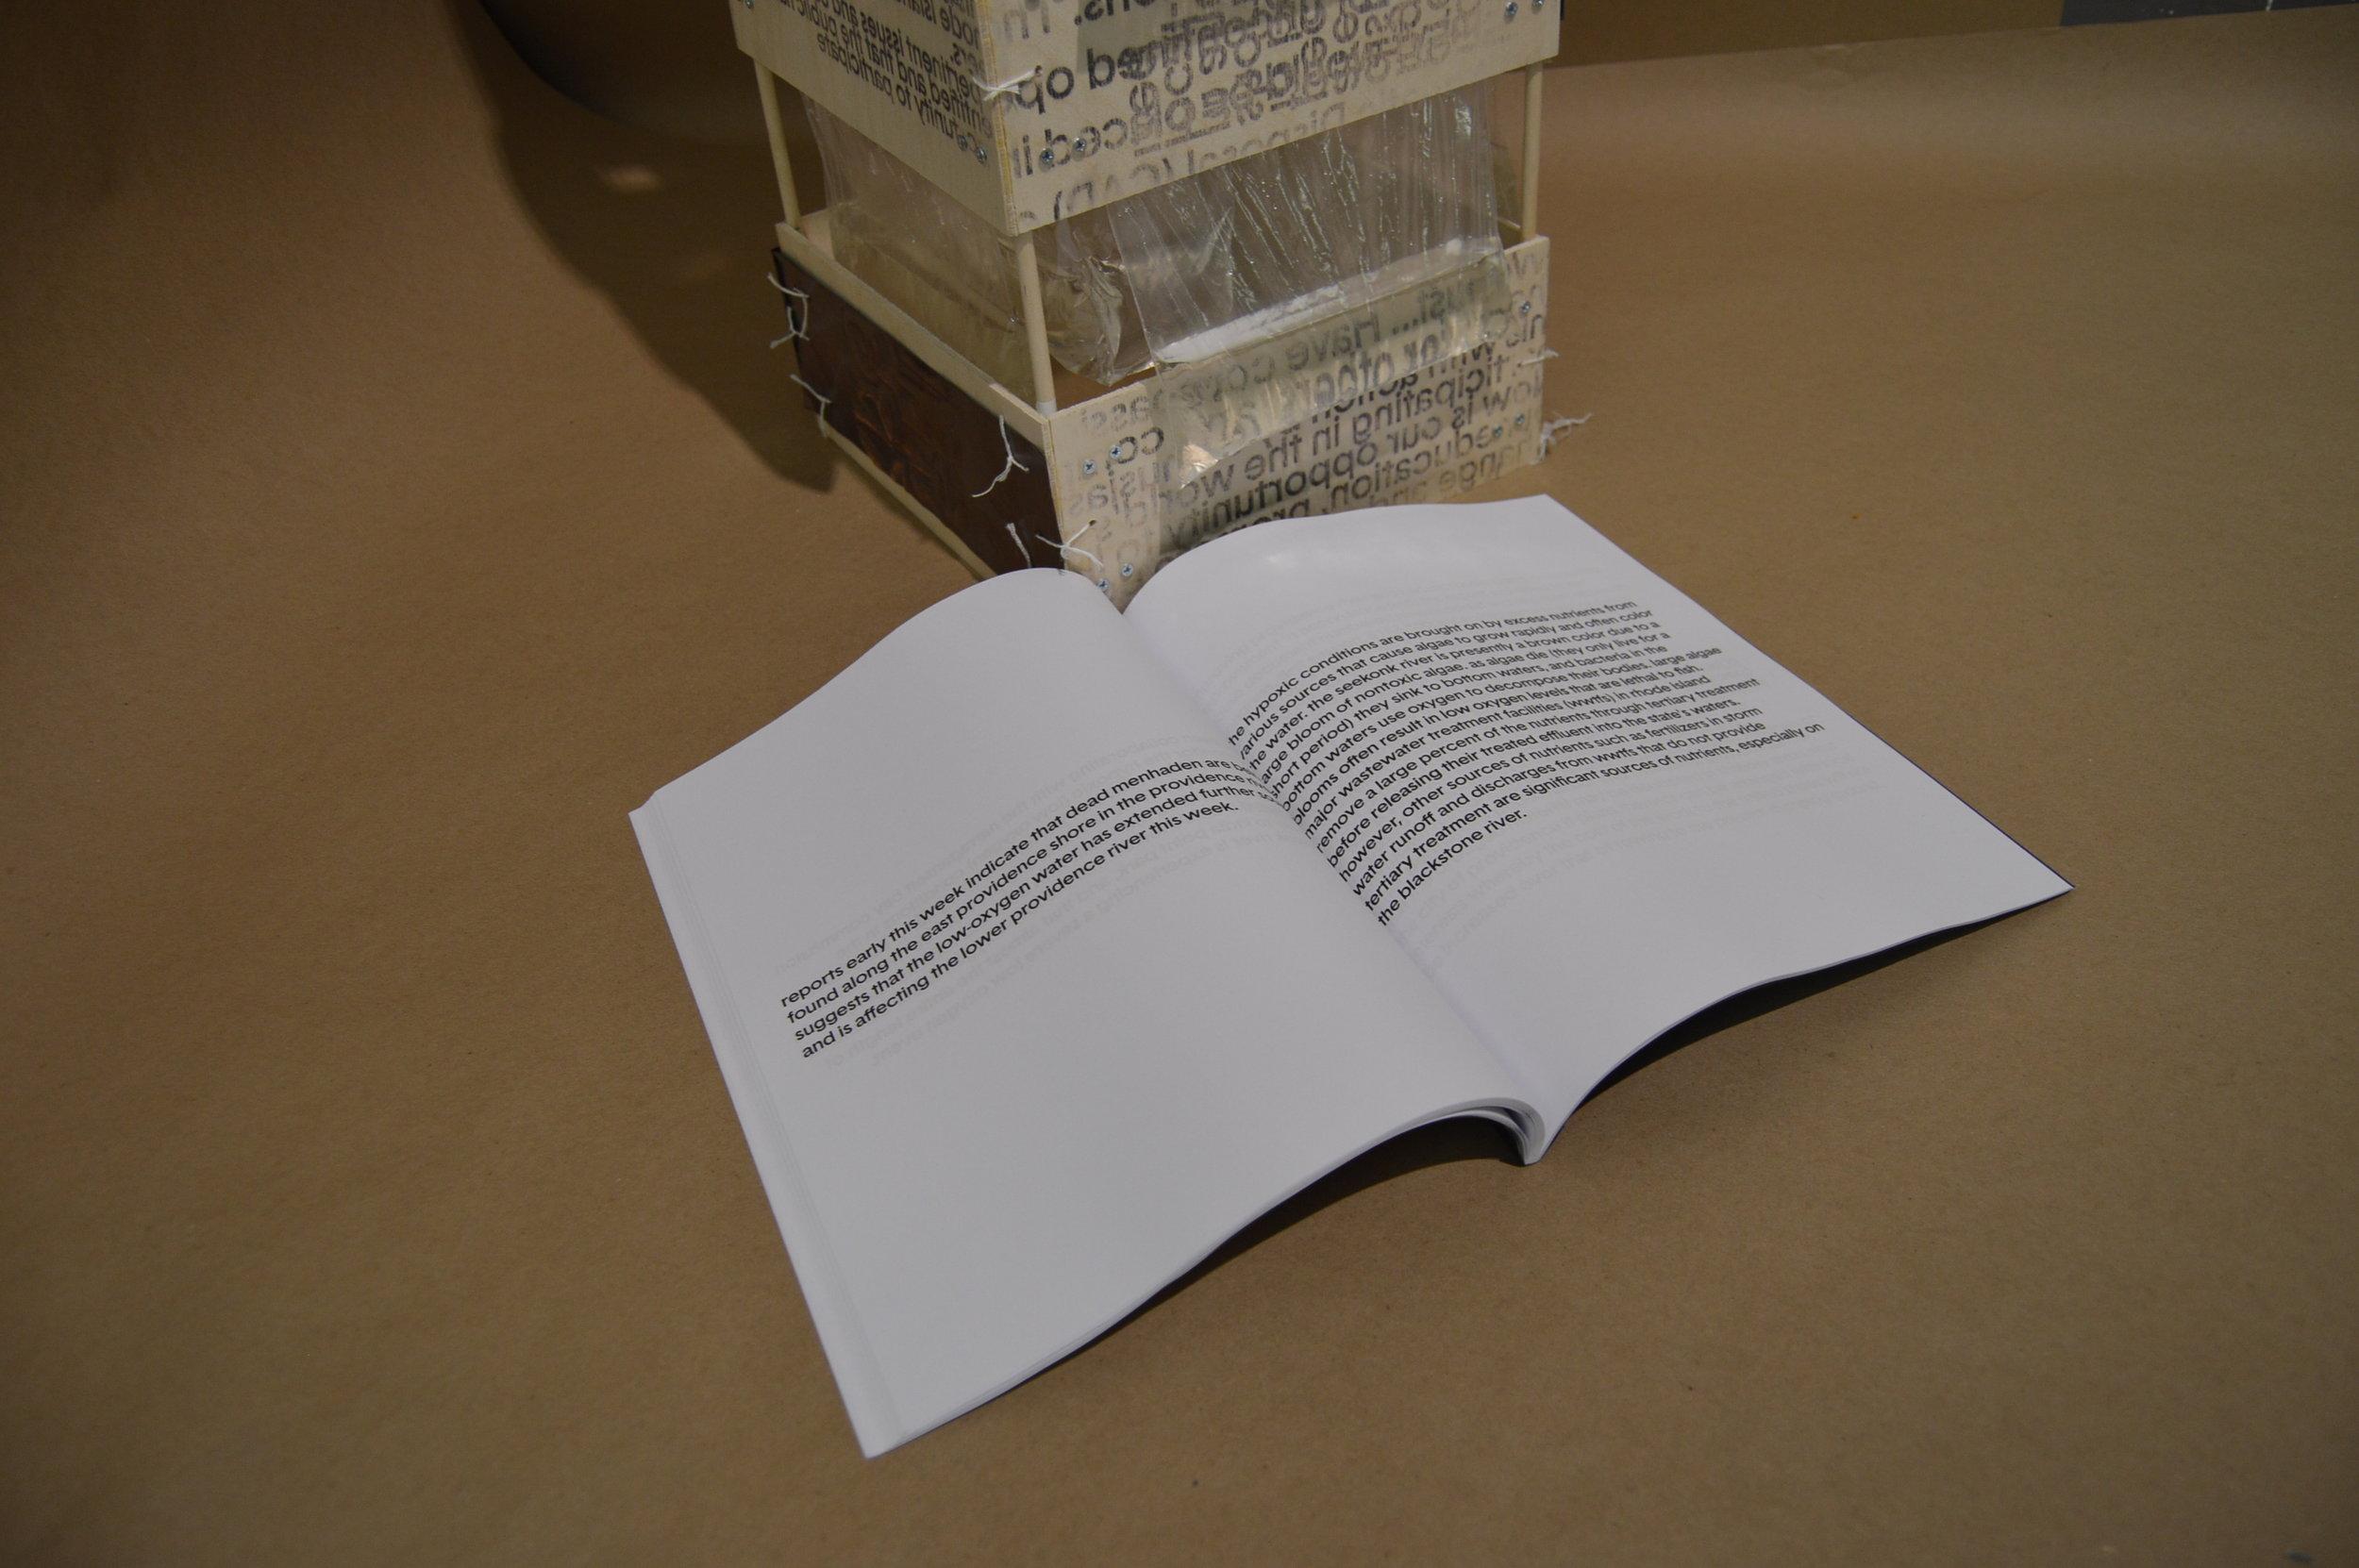 provriv_book_3.JPG